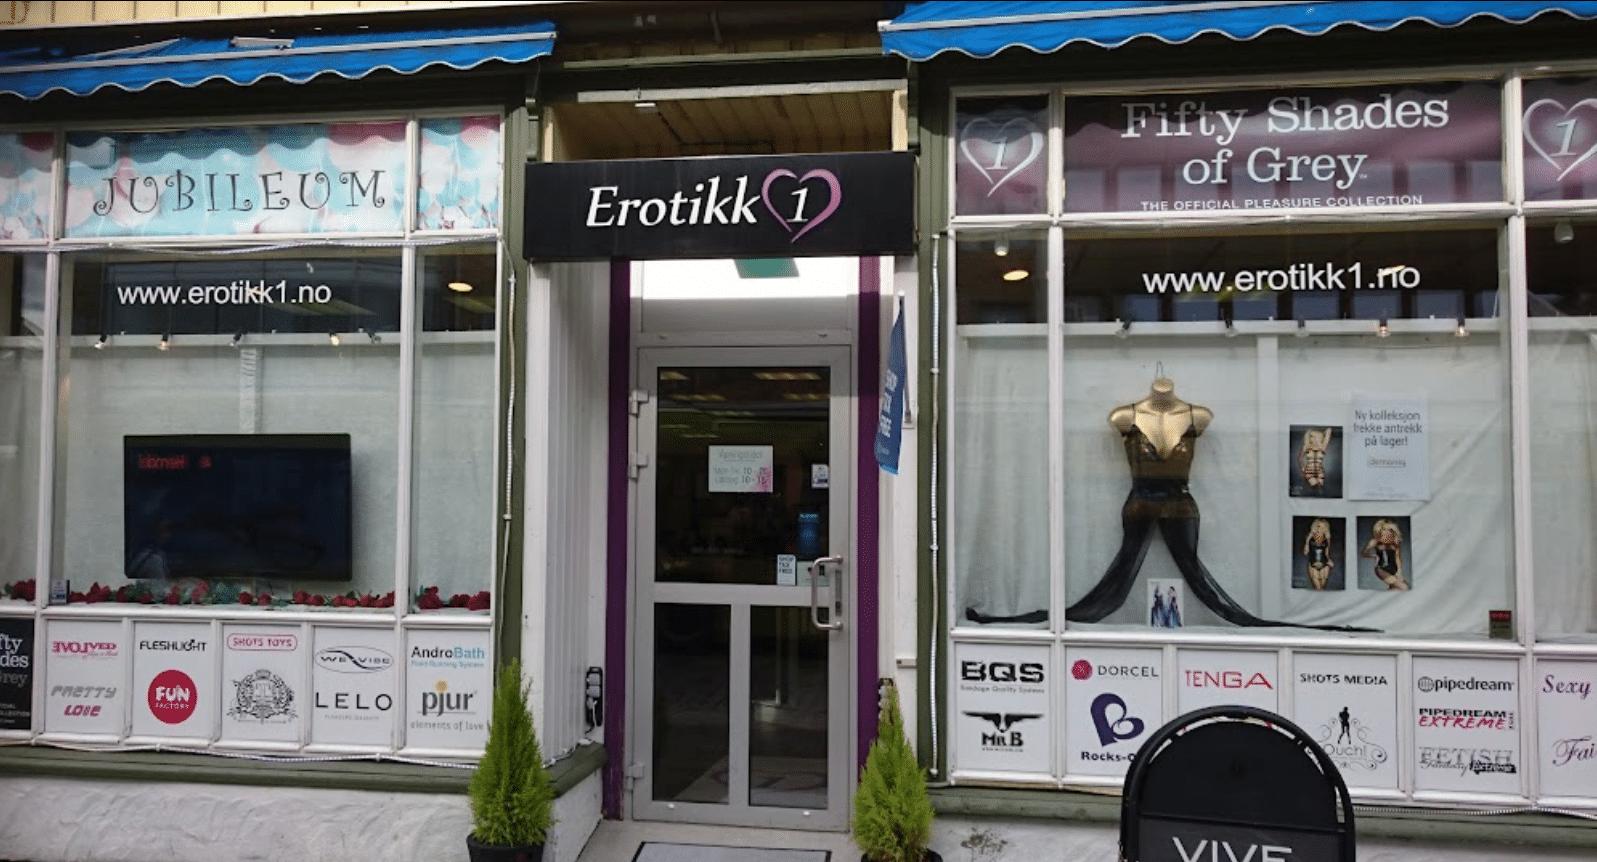 Sex shop Erotikk1